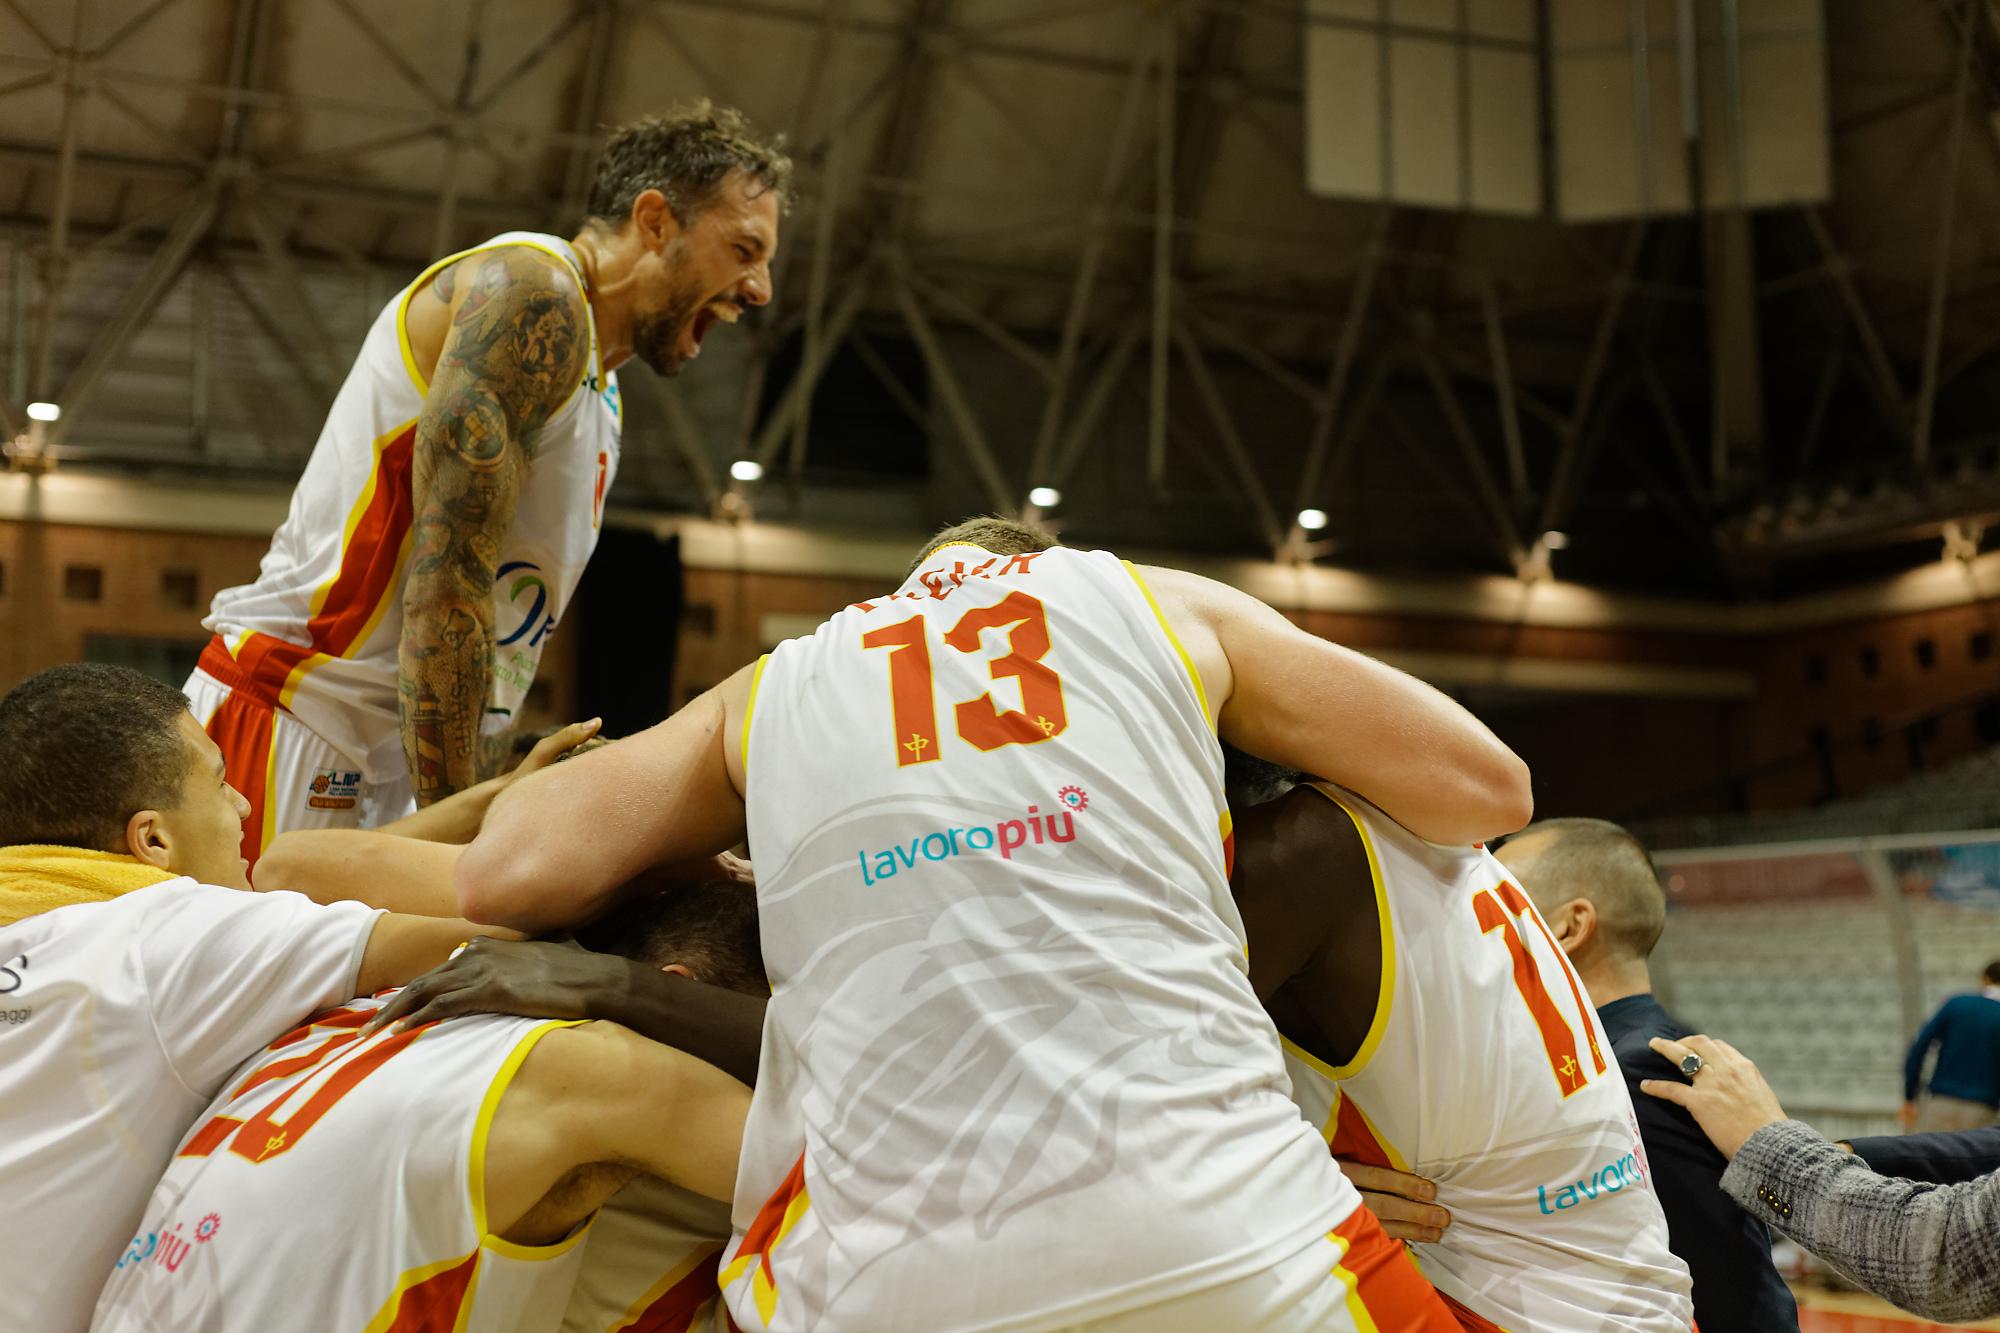 Basket, sconti speciali per OraSì-Orzinuovi